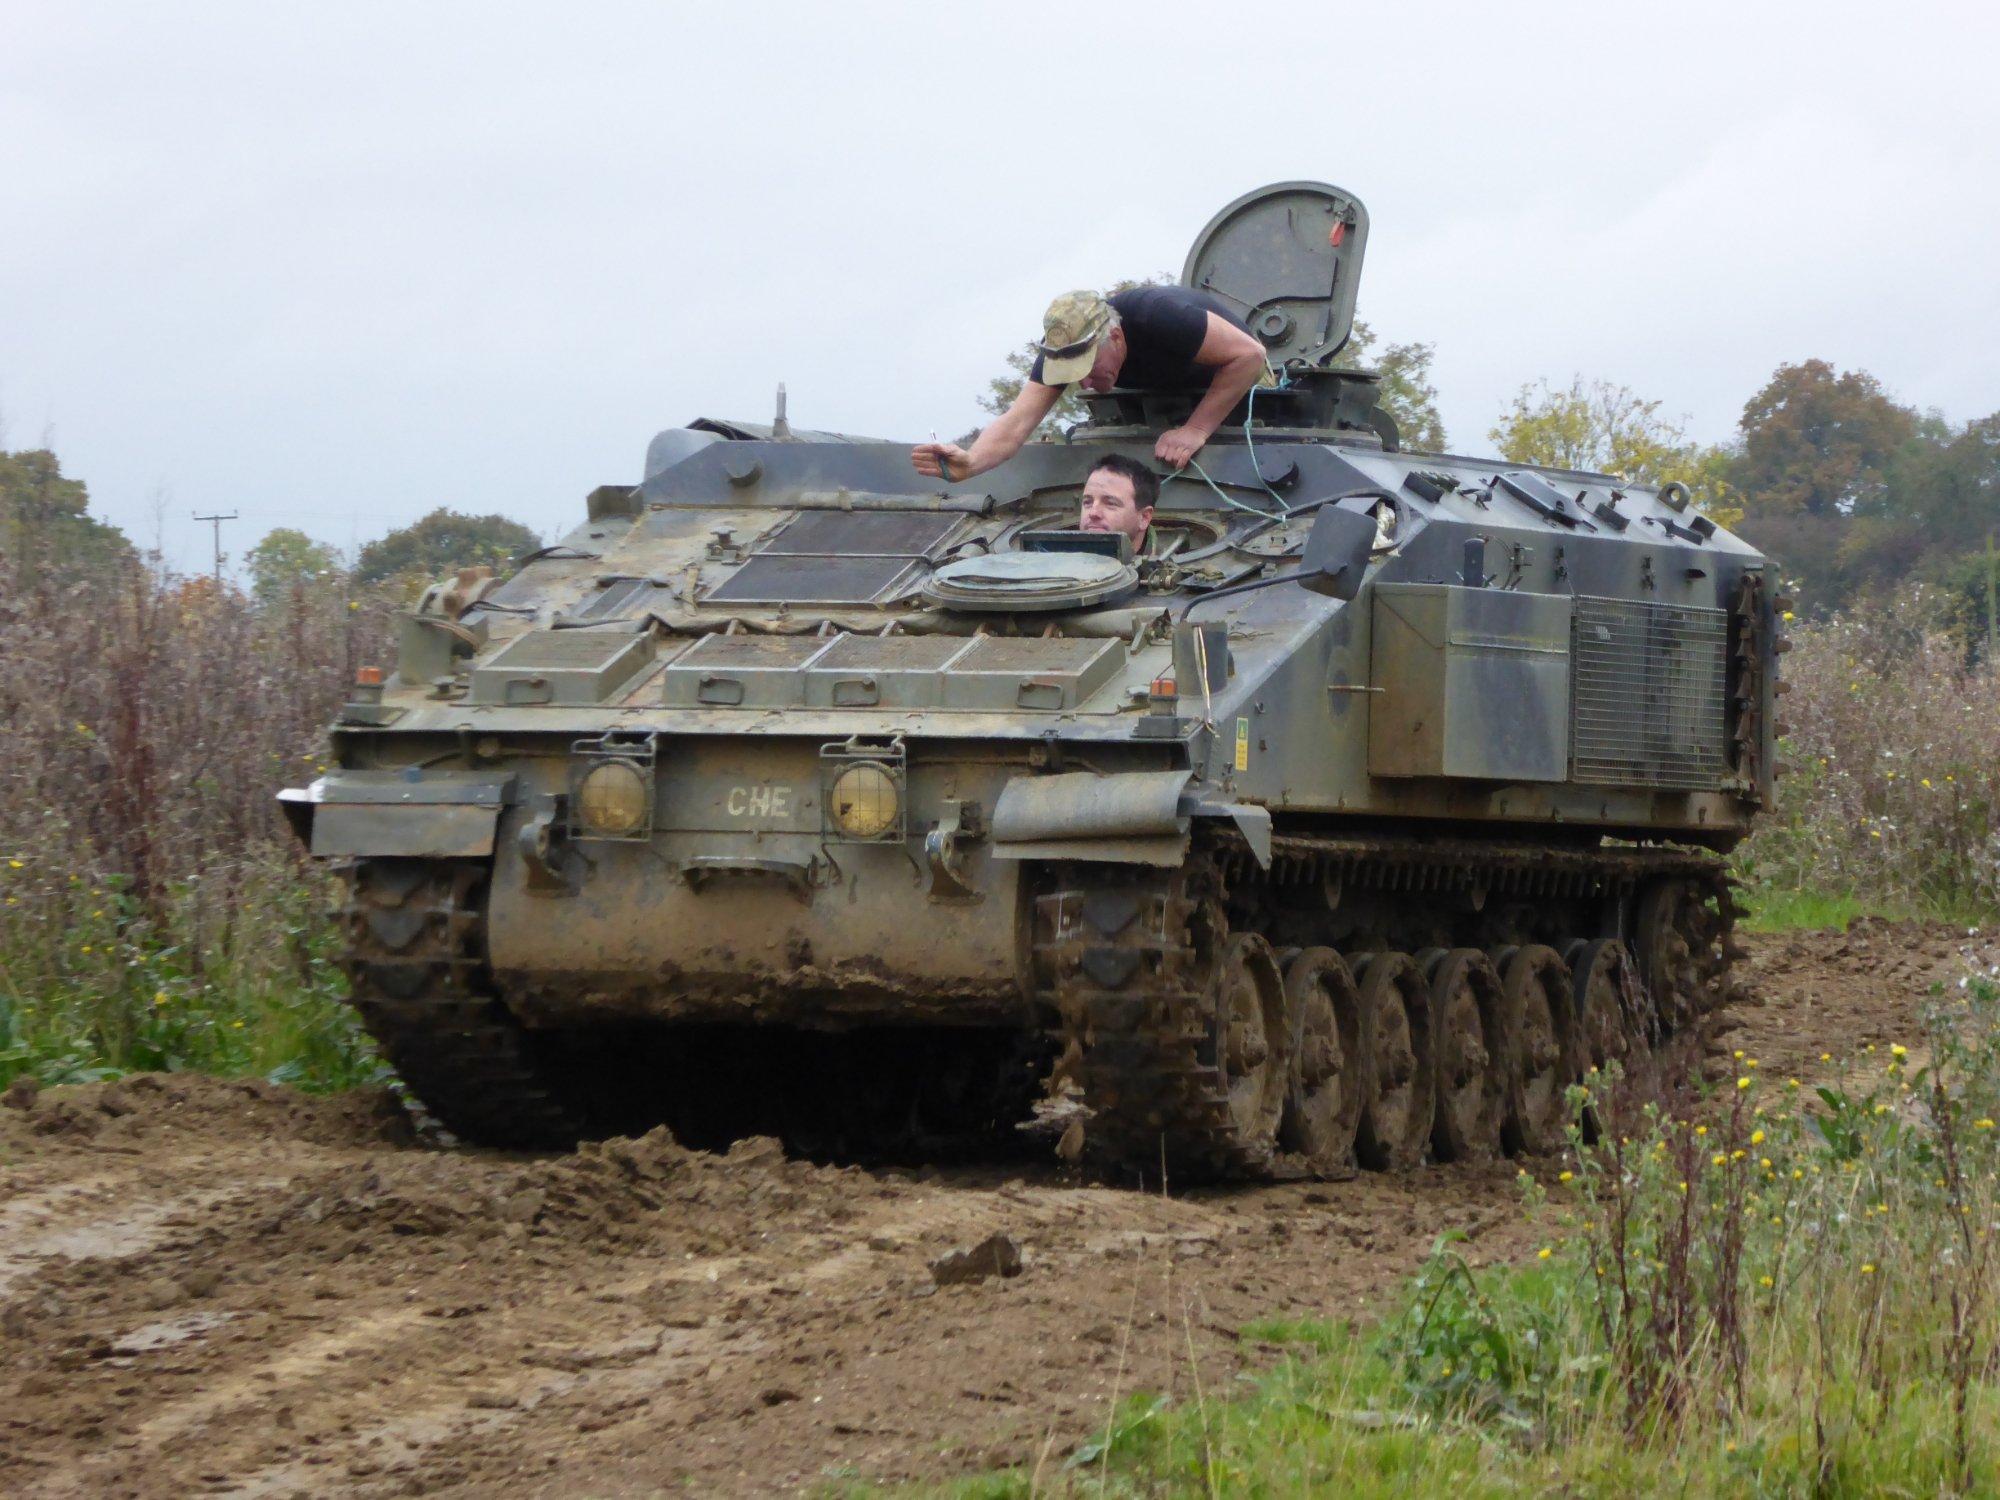 Tanks-Alot Half Day Tank Driving Experience Stormer HVM